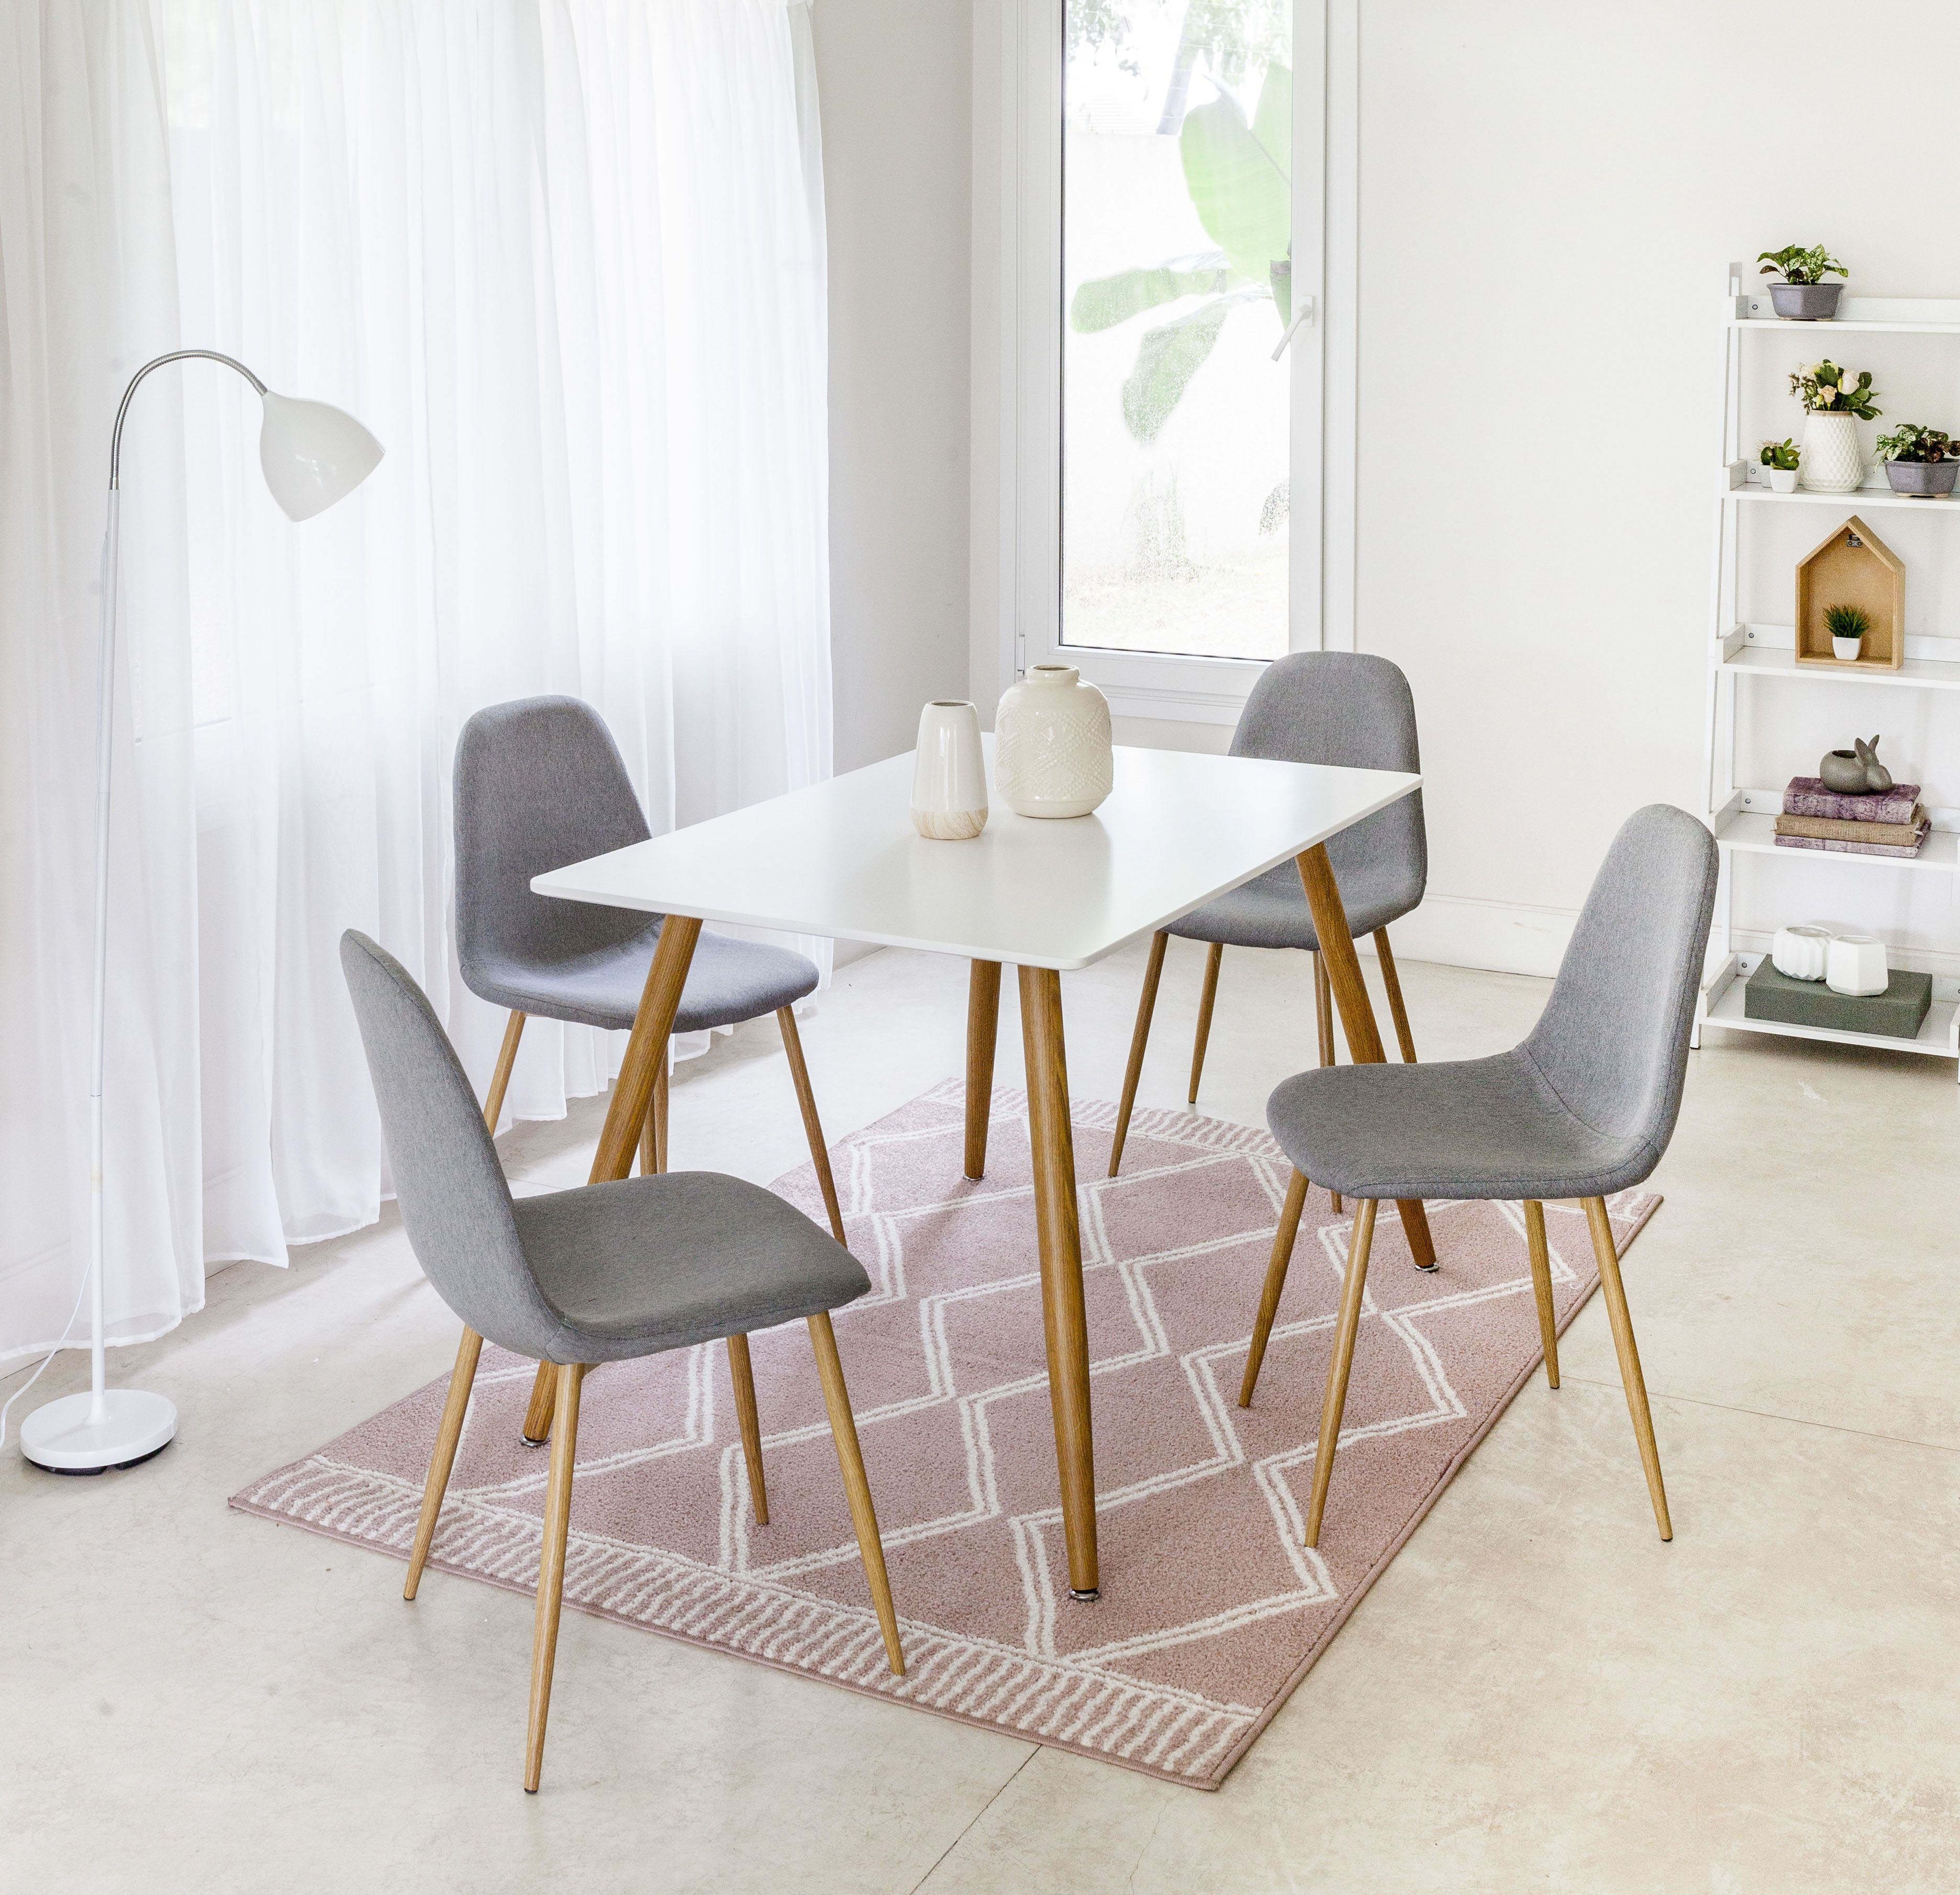 Comedor 4 Sillas Crispin #juegodecomedor #mesa #sillas #crispi ...